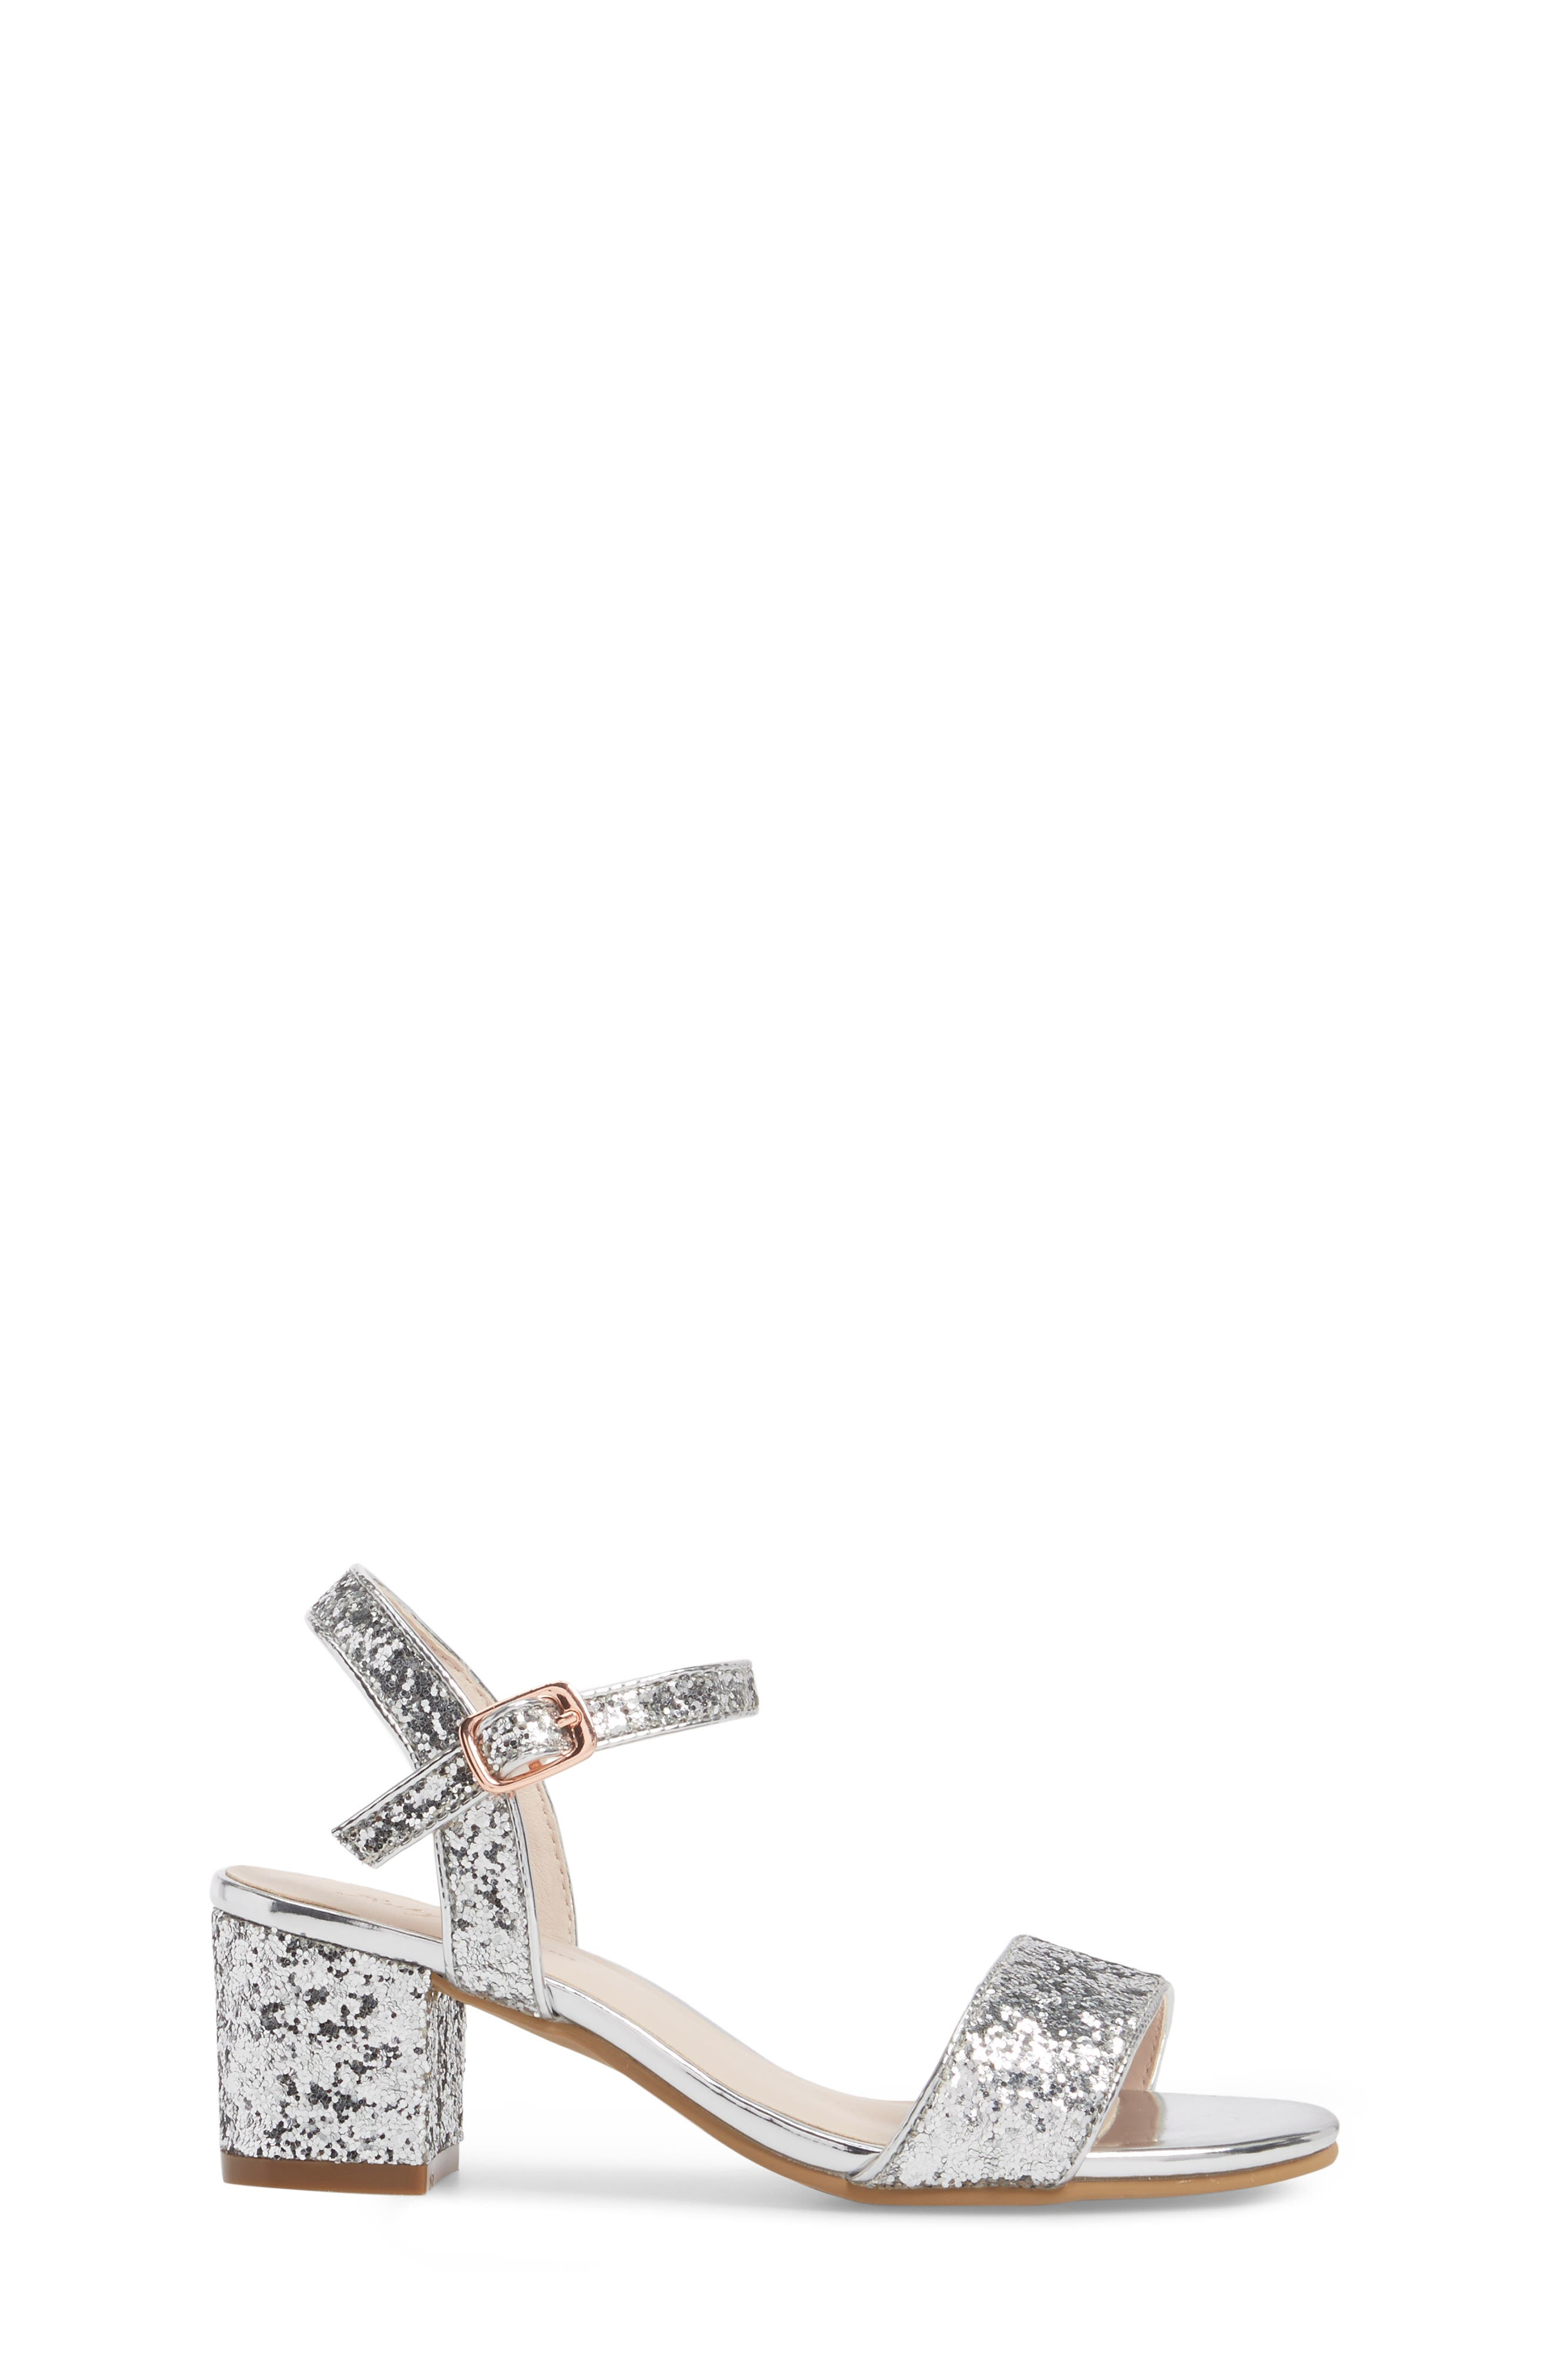 Danni Block Heel Sandal,                             Alternate thumbnail 3, color,                             SILVER GLITTER